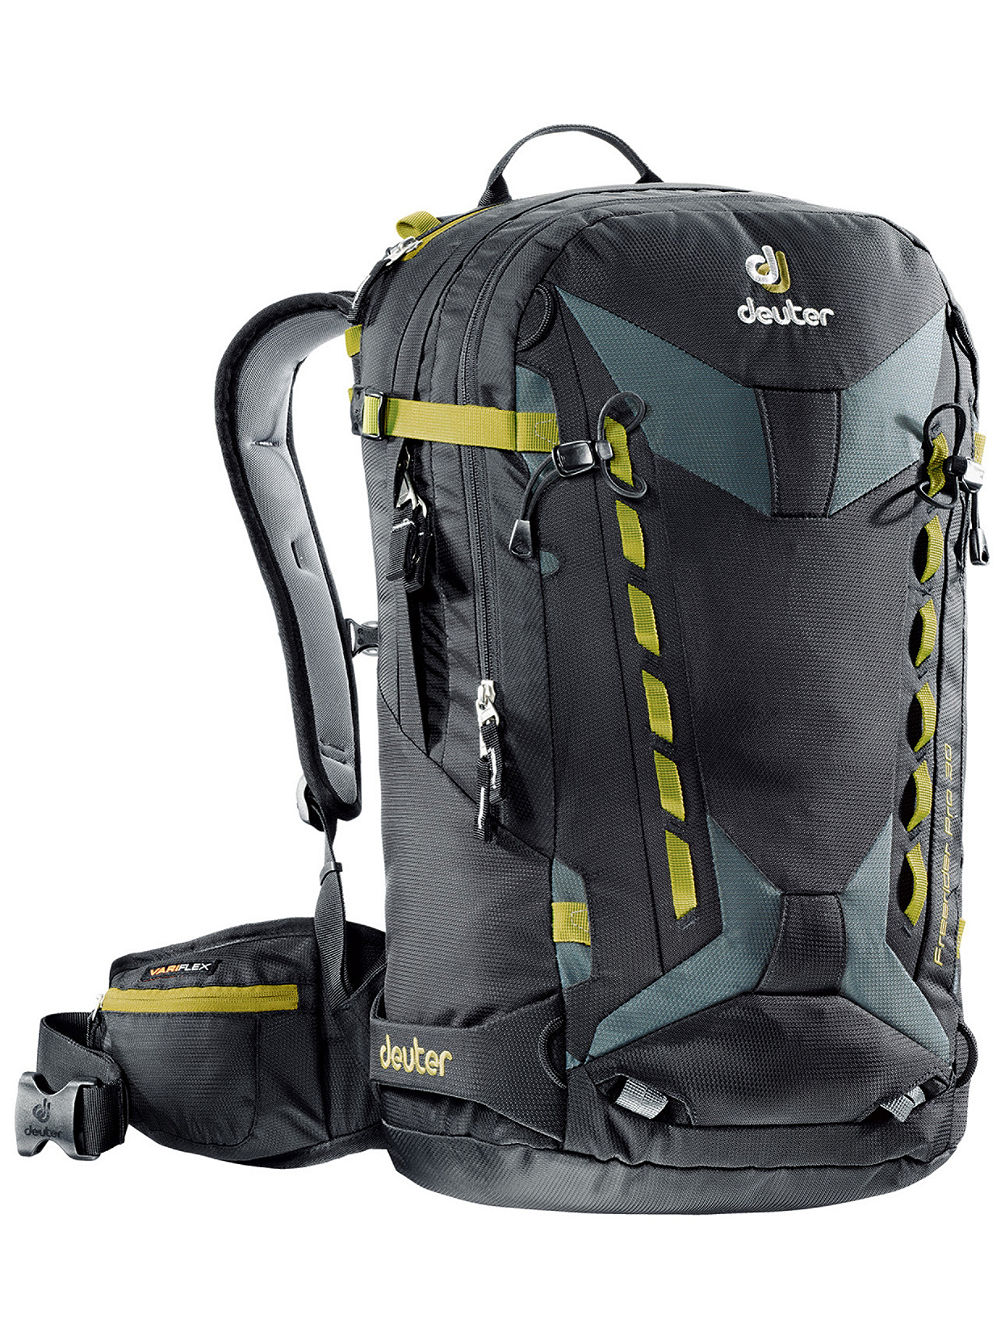 deuter-freerider-pro-30l-backpack